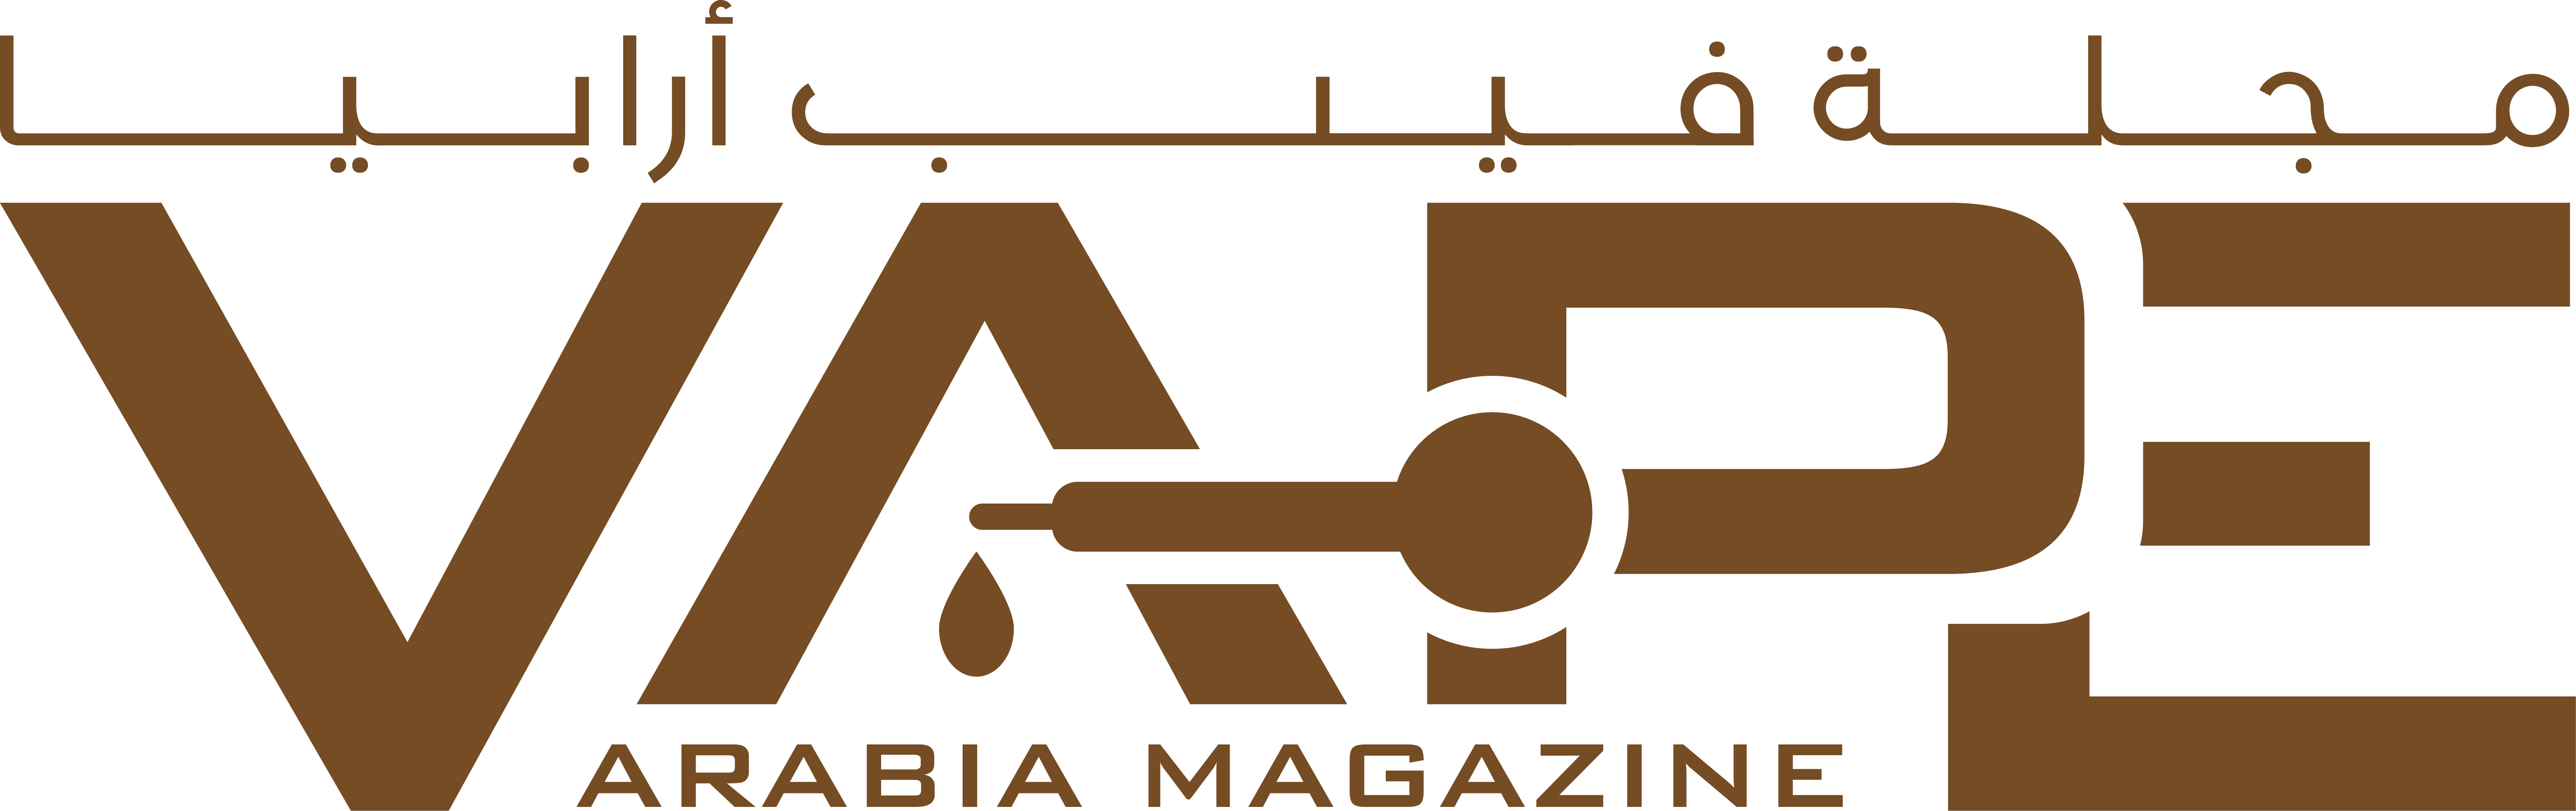 Vape Arabia Logo